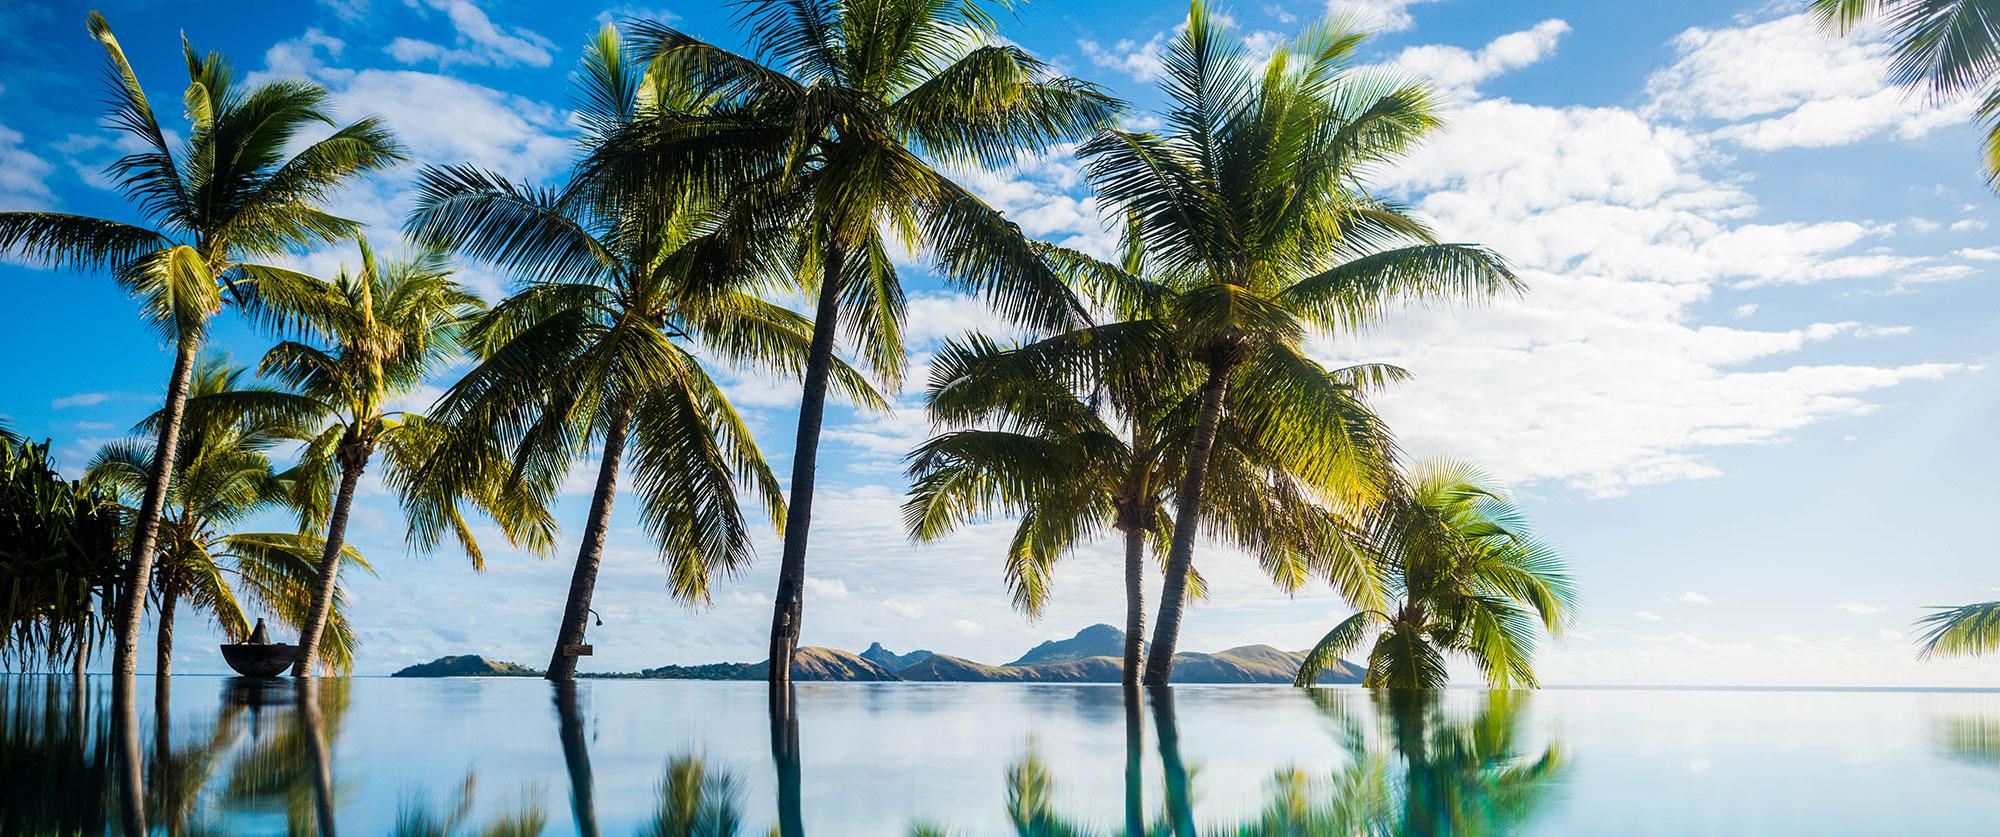 Fiji Islands Honeymoon: Plunge Pools, Beaches, Adventure